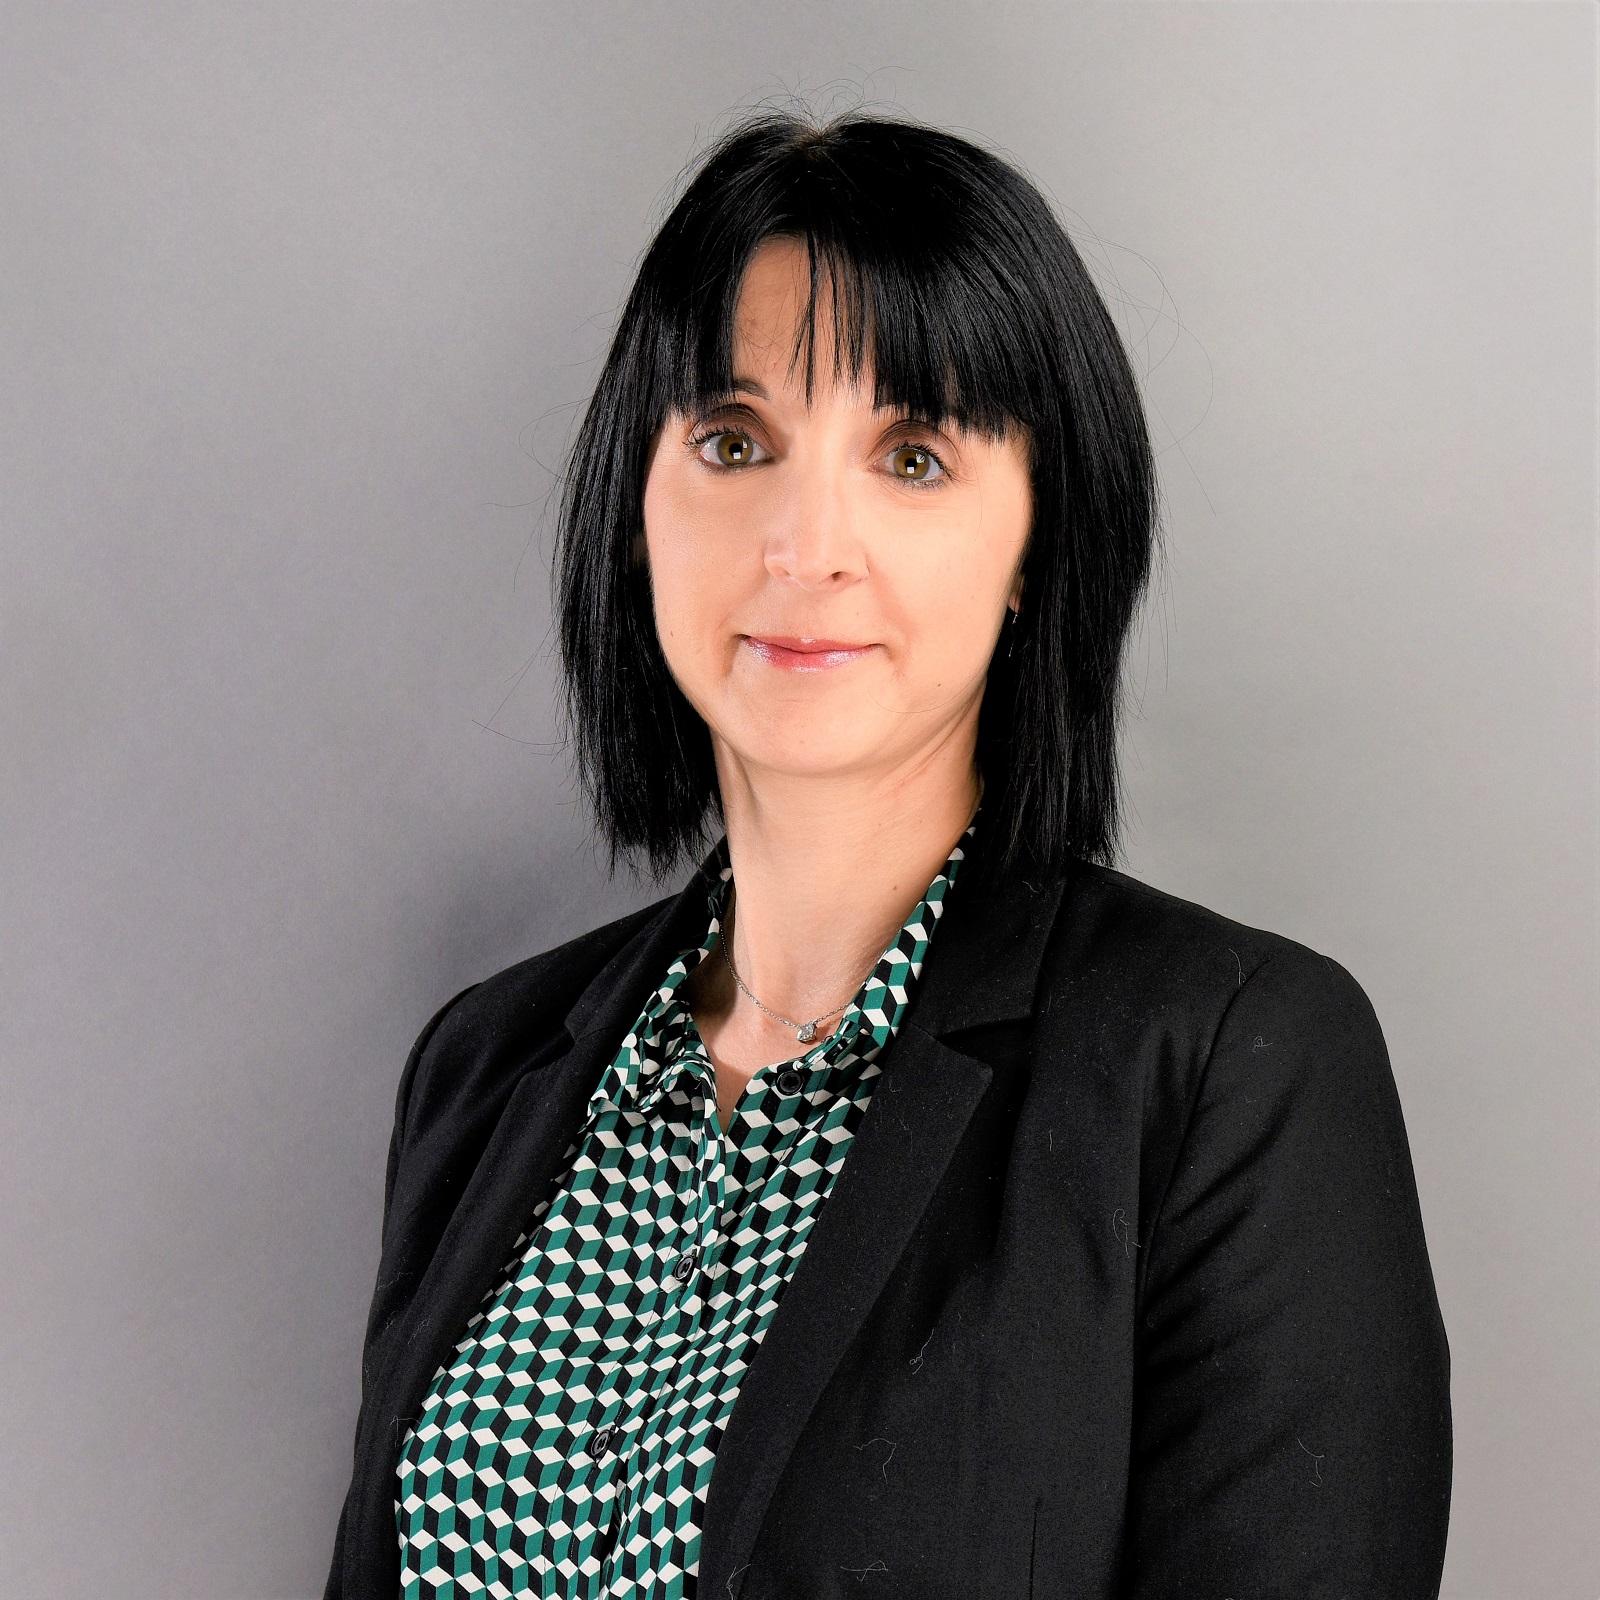 Alexandra Bréa